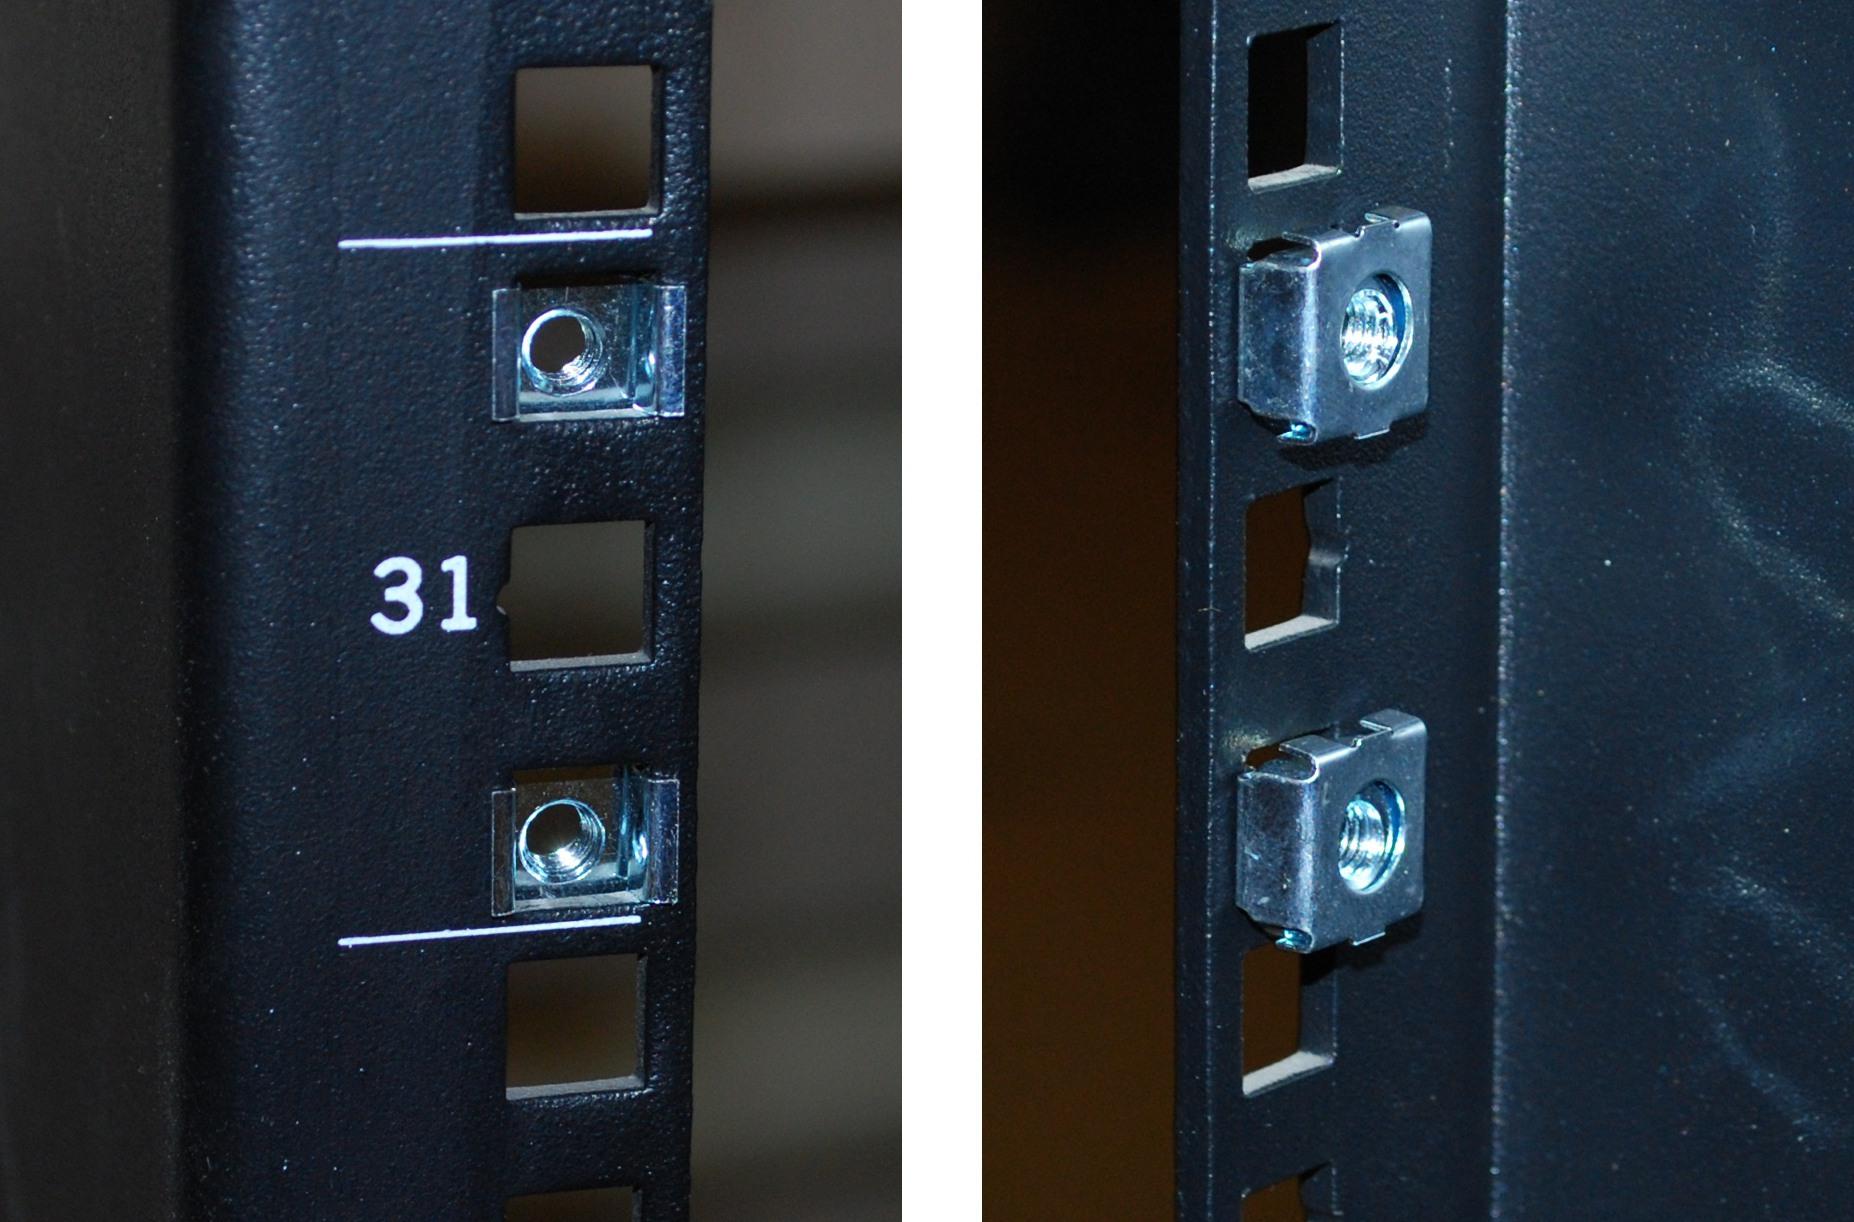 Крепление гаек на задней части стойки. Слева - вид снаружи, справа - внутри.